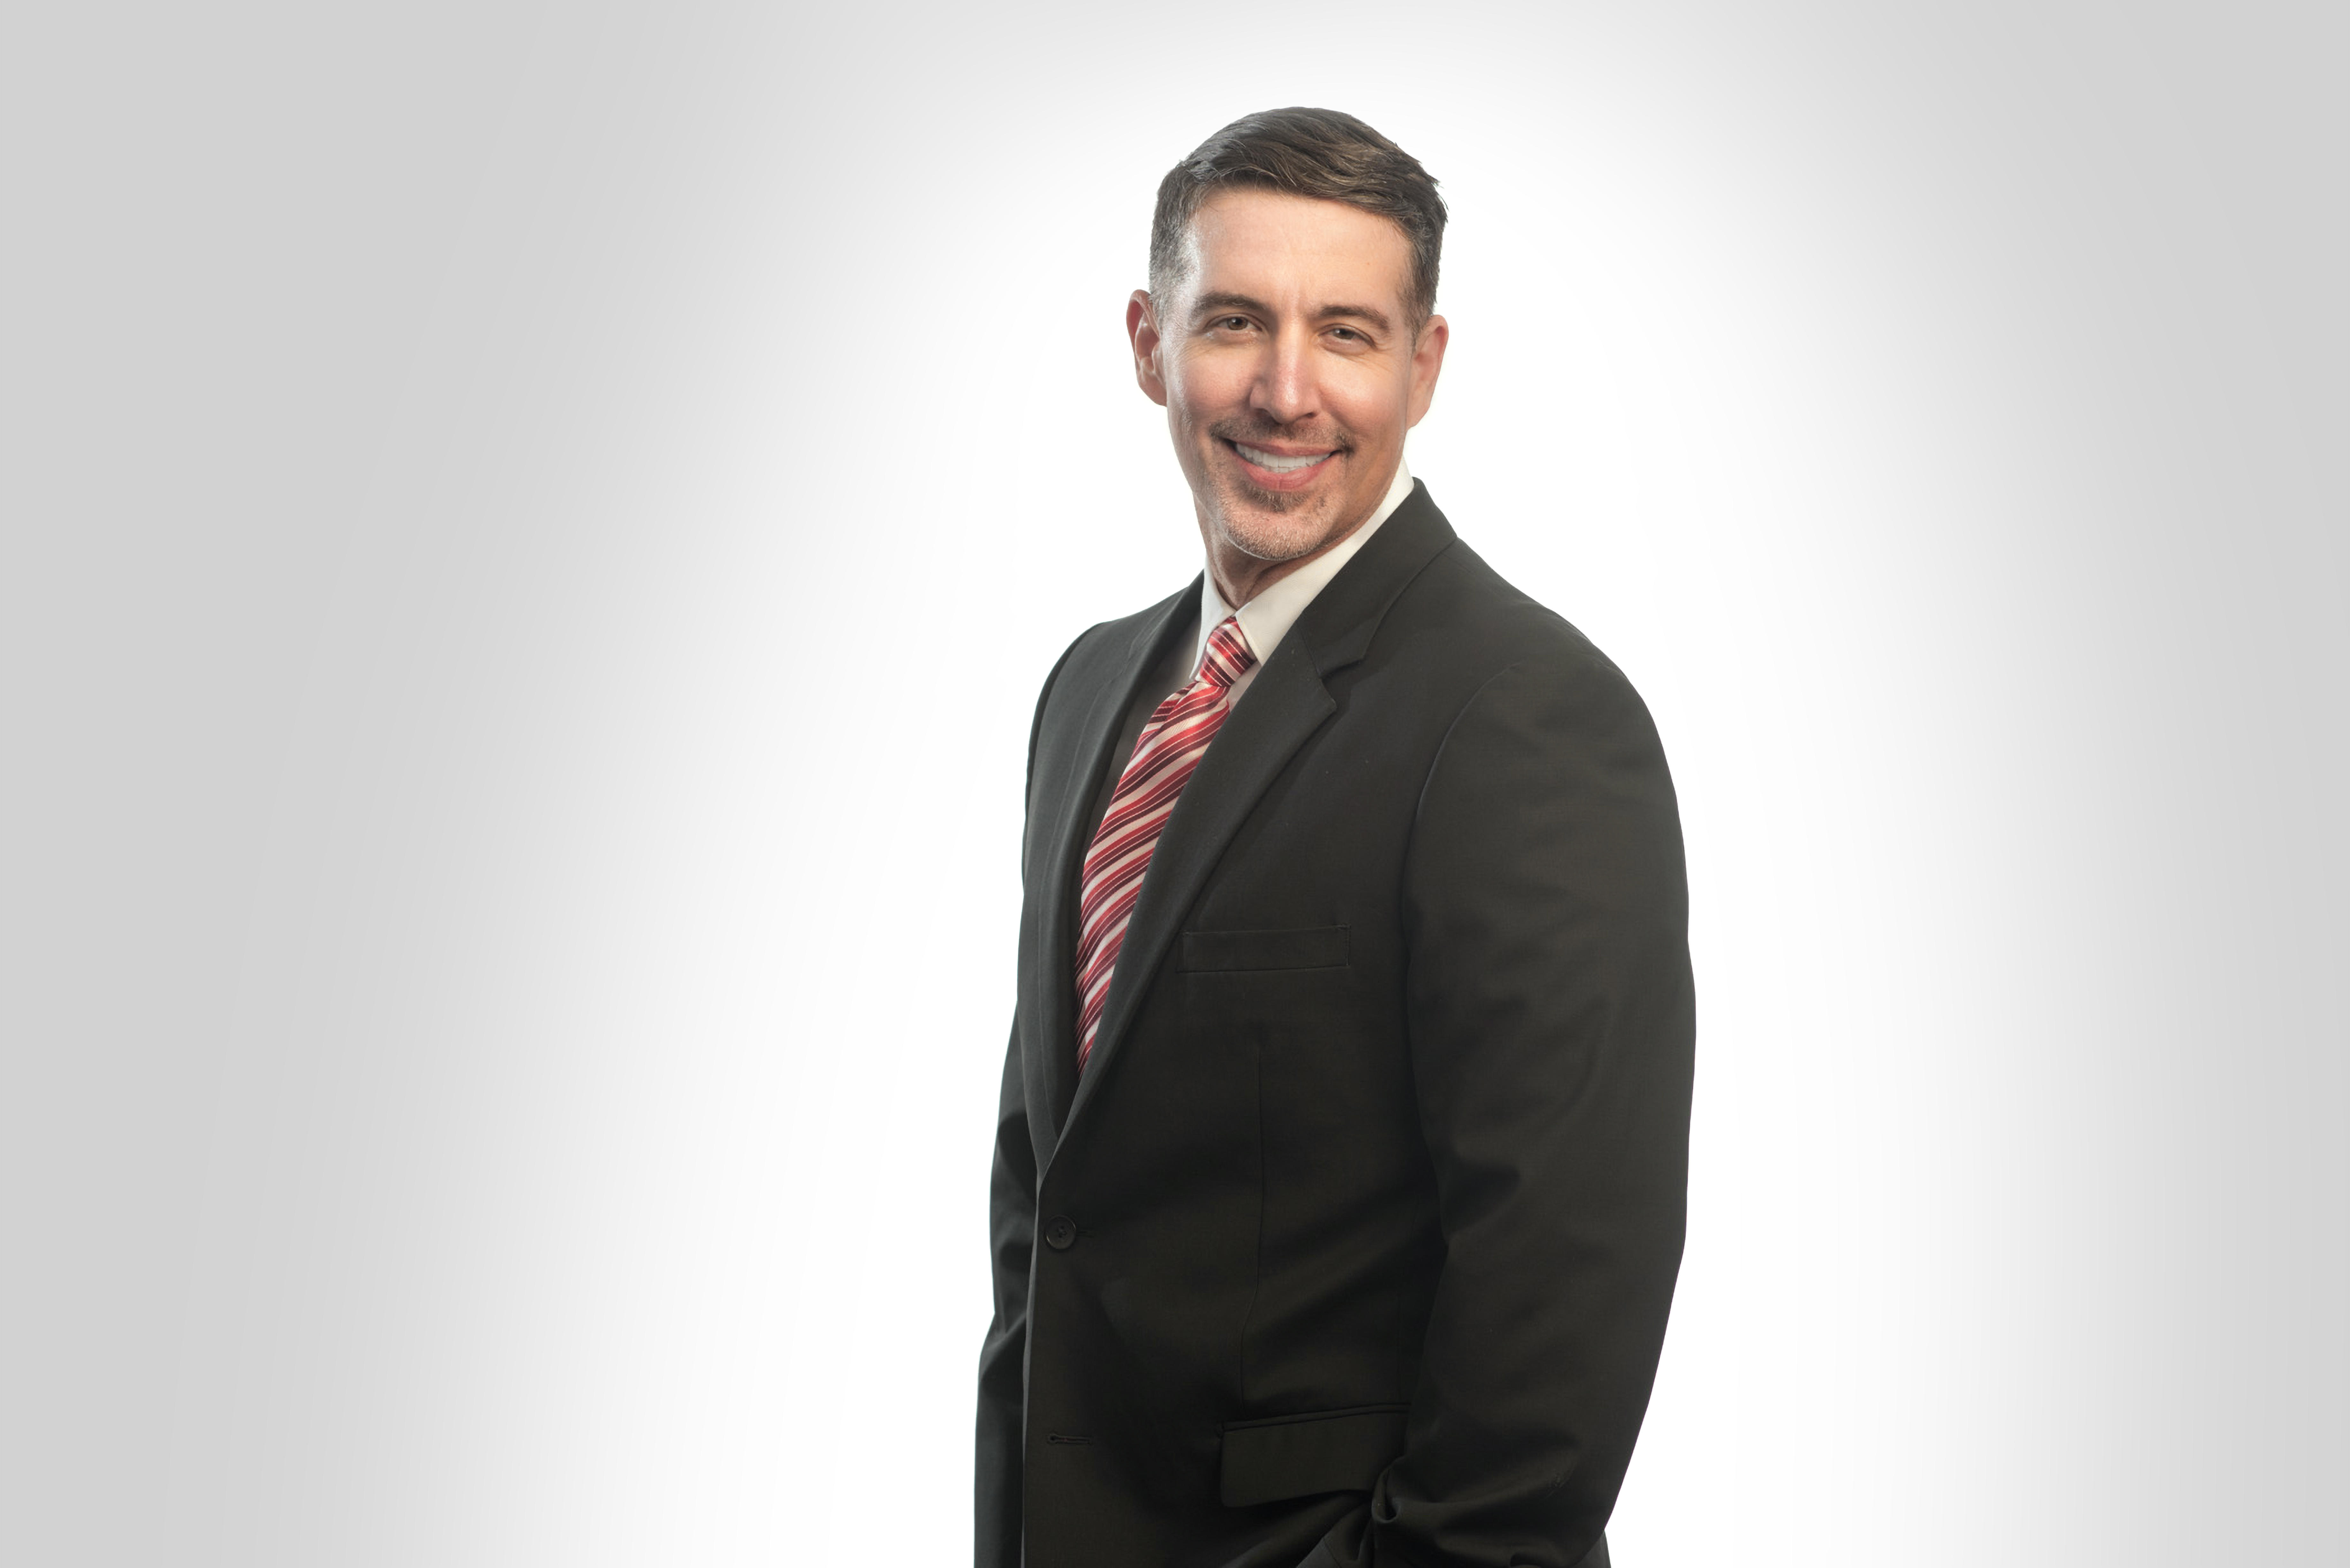 Michael F. Cunningham, MD